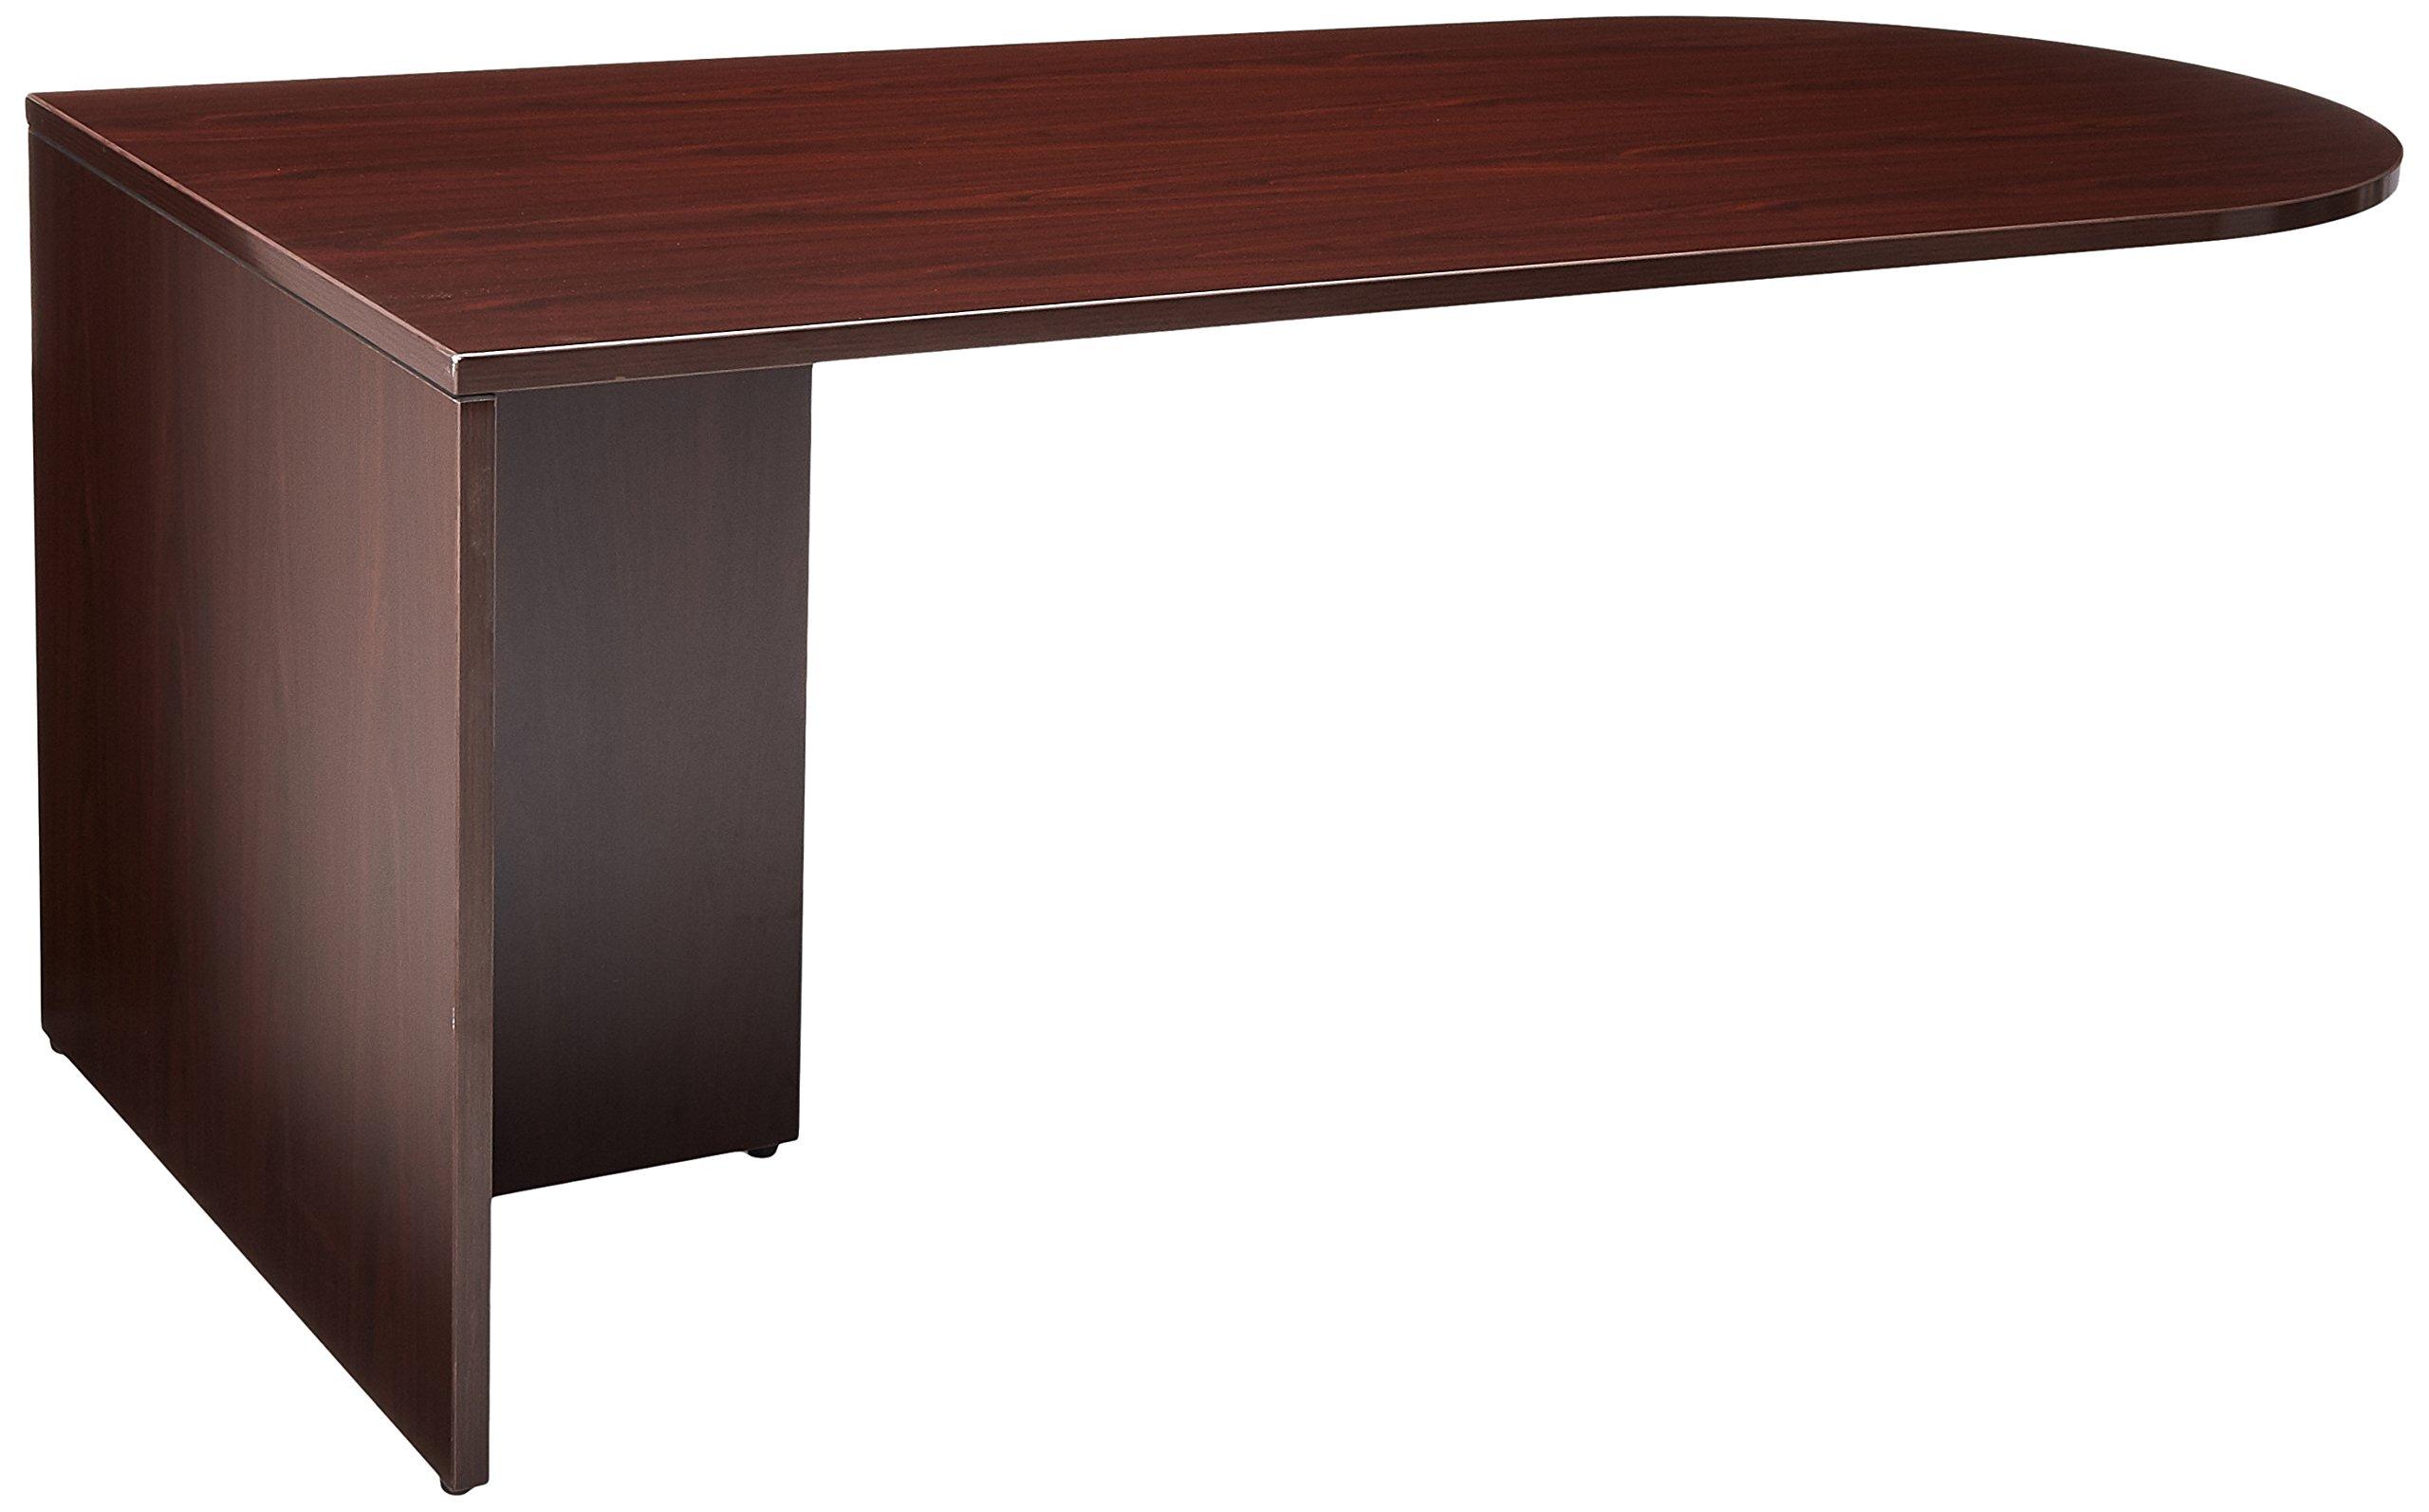 Lorell LLR69379 69000 Series Desk, Mahogany